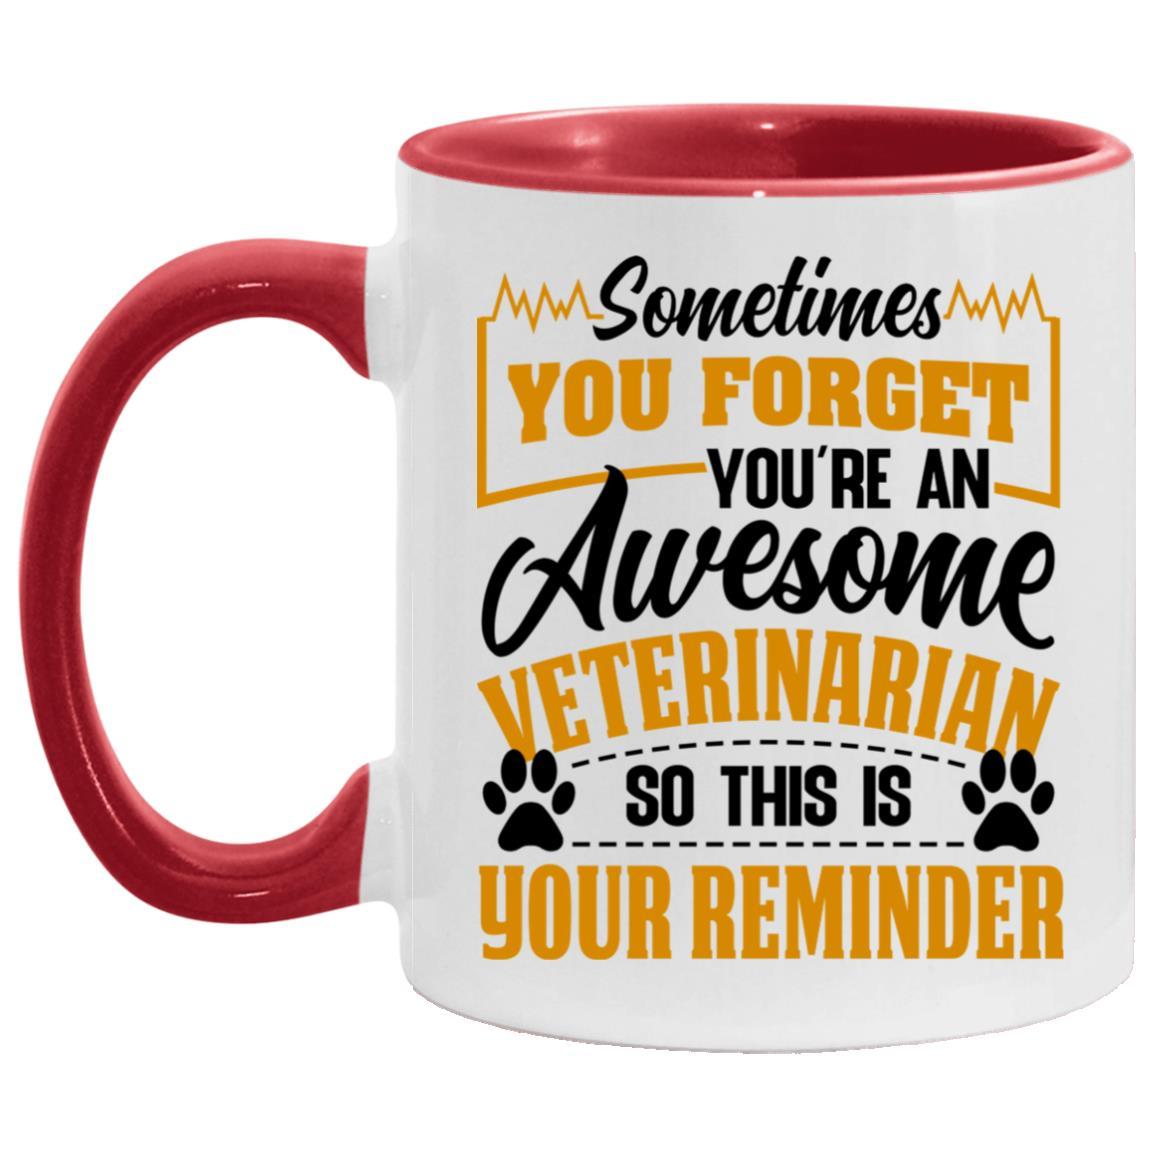 Funny mug Veterinarian Gift Veterinarian Mug Veterinarian Trump Mug